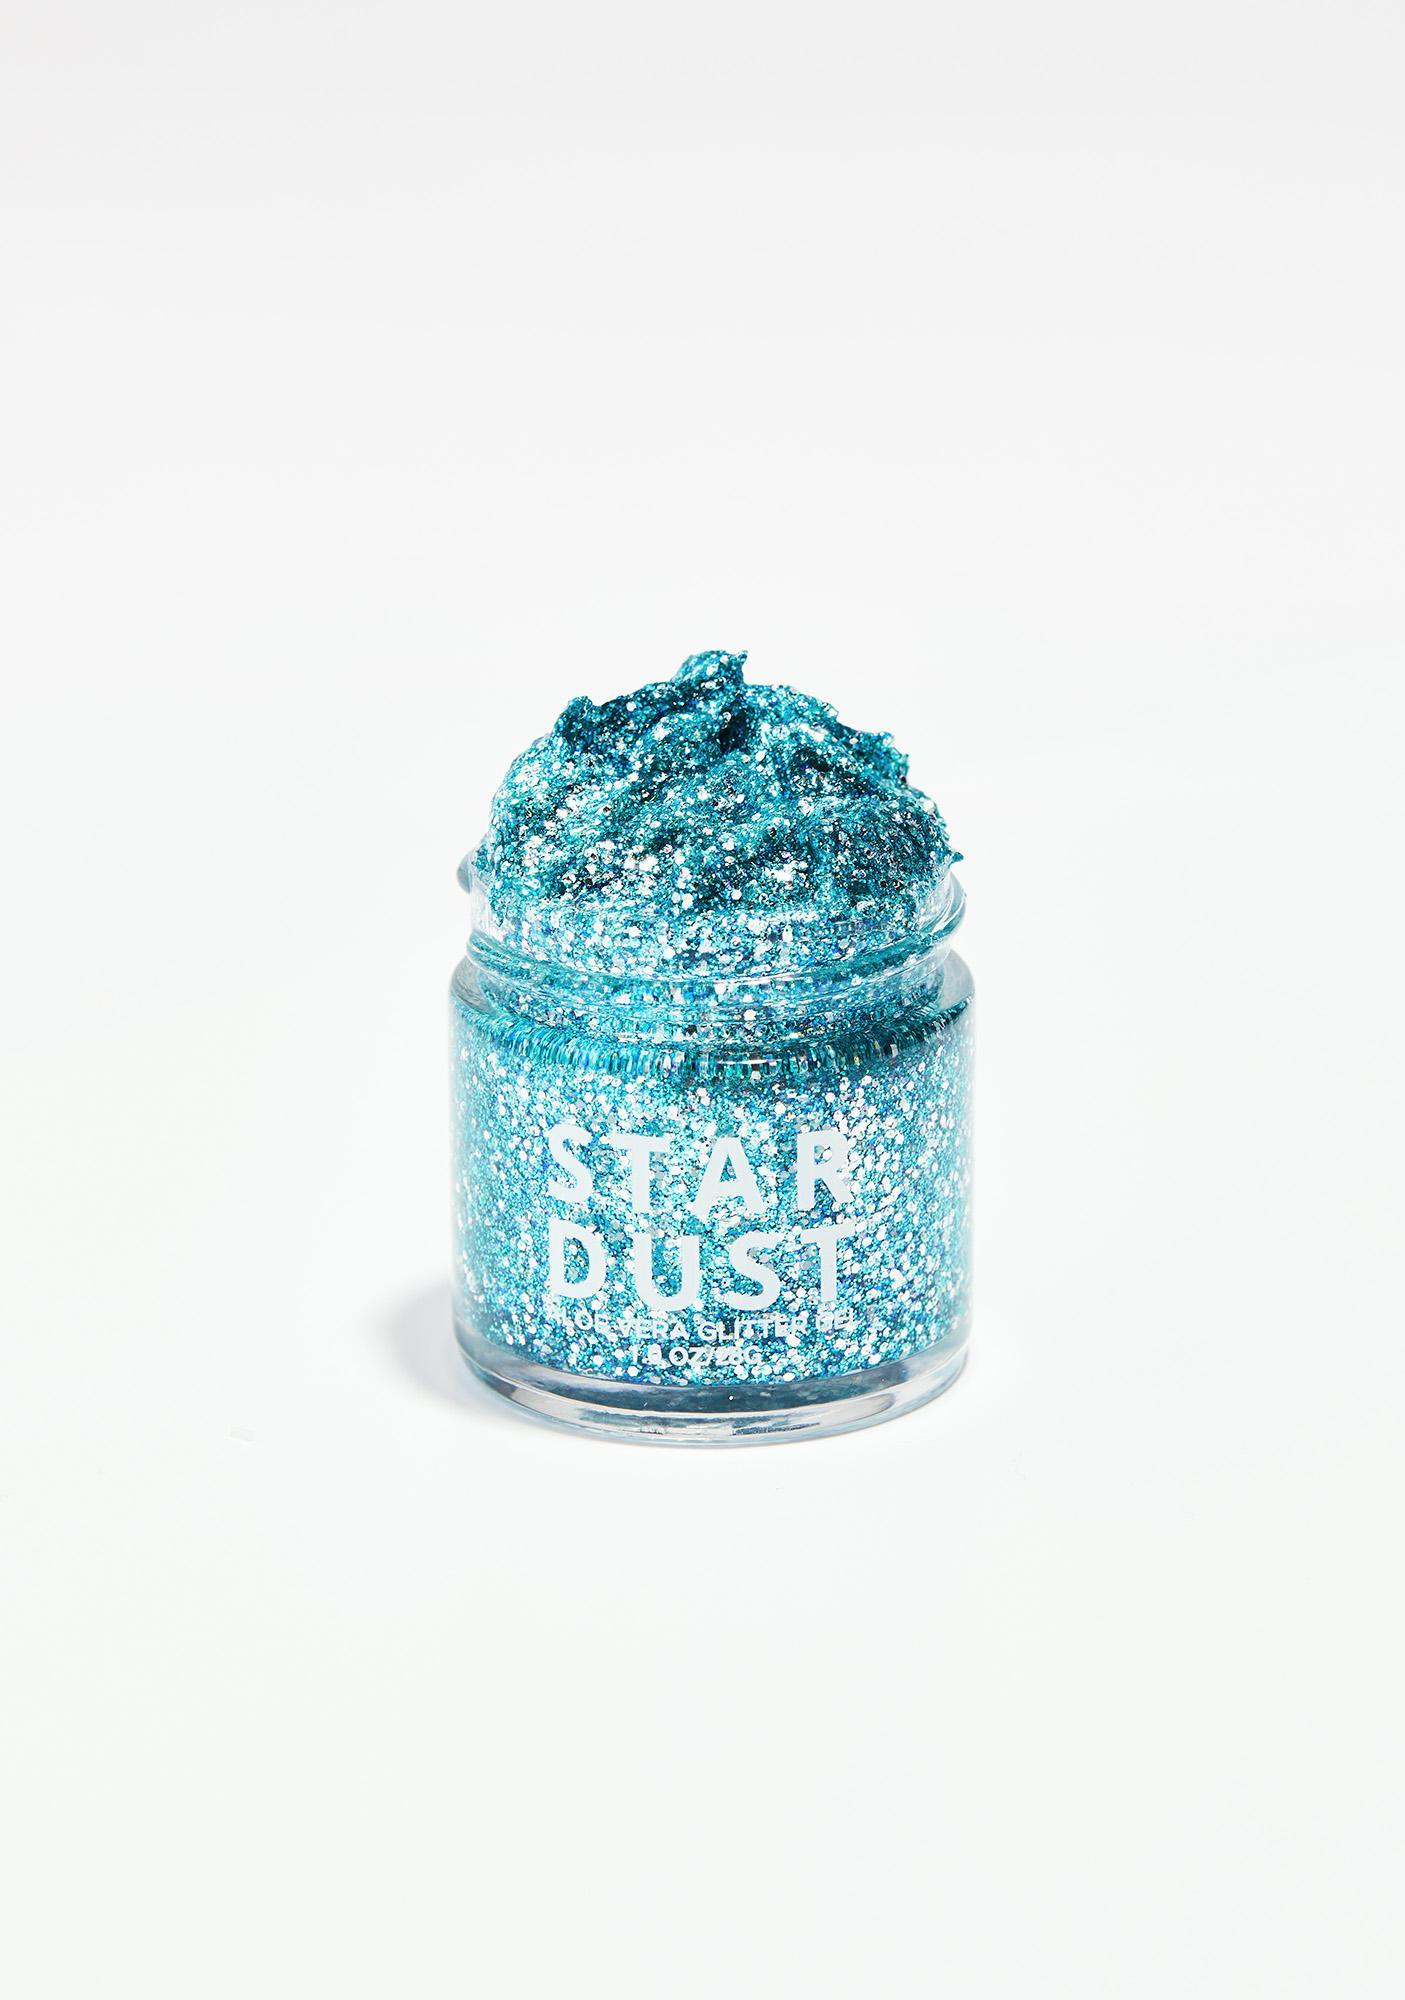 Lavender Stardust Blue Dream Glitter Gel Pot